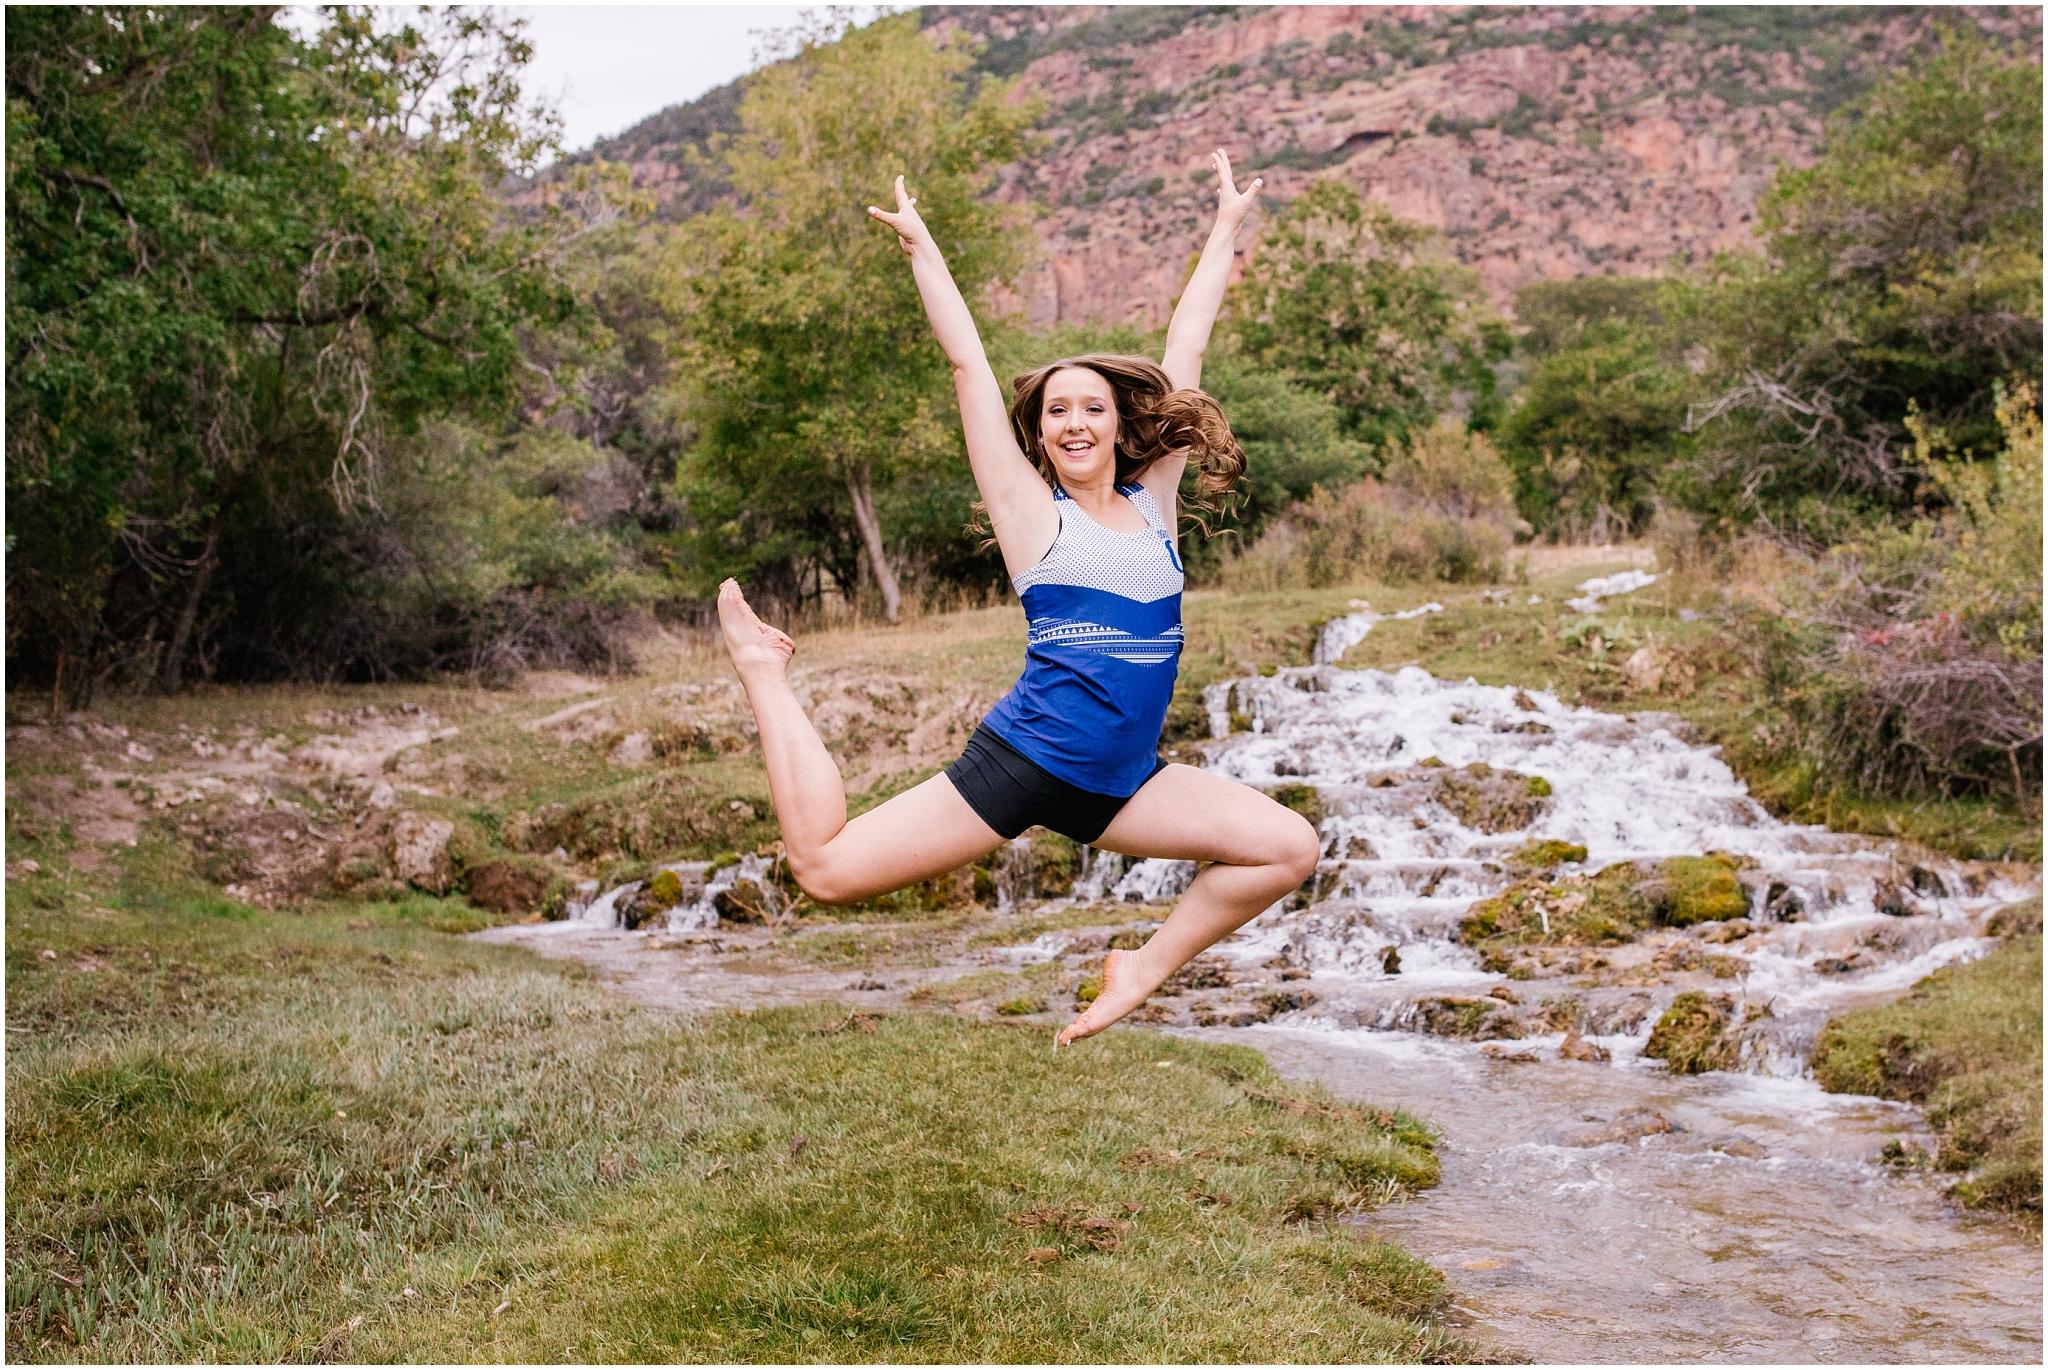 GVHSDRILL-57_Lizzie-B-Imagery-Utah-Family-Photographer-Central-Utah-Park-City-Salt-Lake-City-Drill-Team-Photography-Dance.jpg